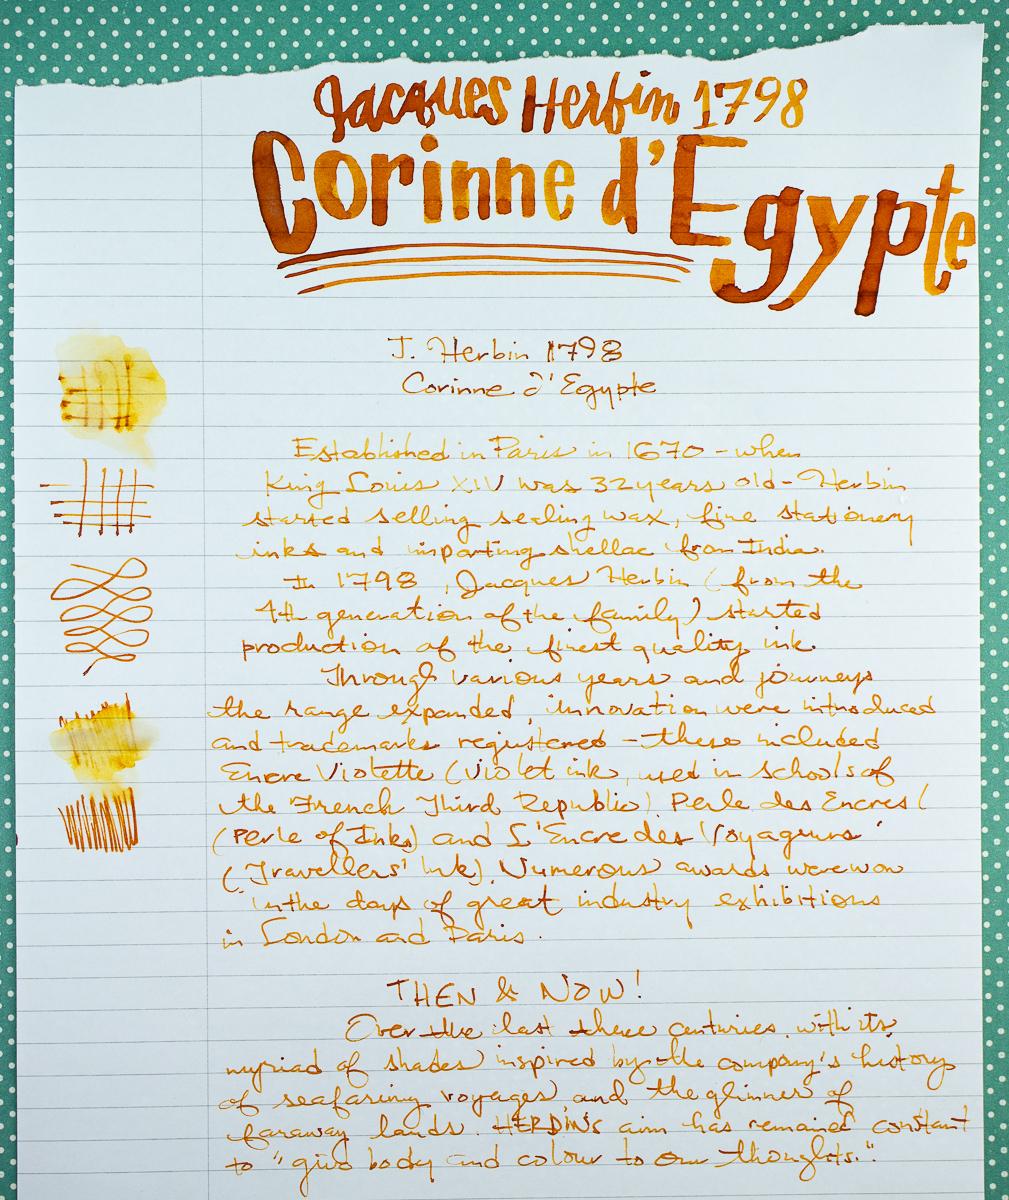 Jacques Herbin Cornaline d'Egypte